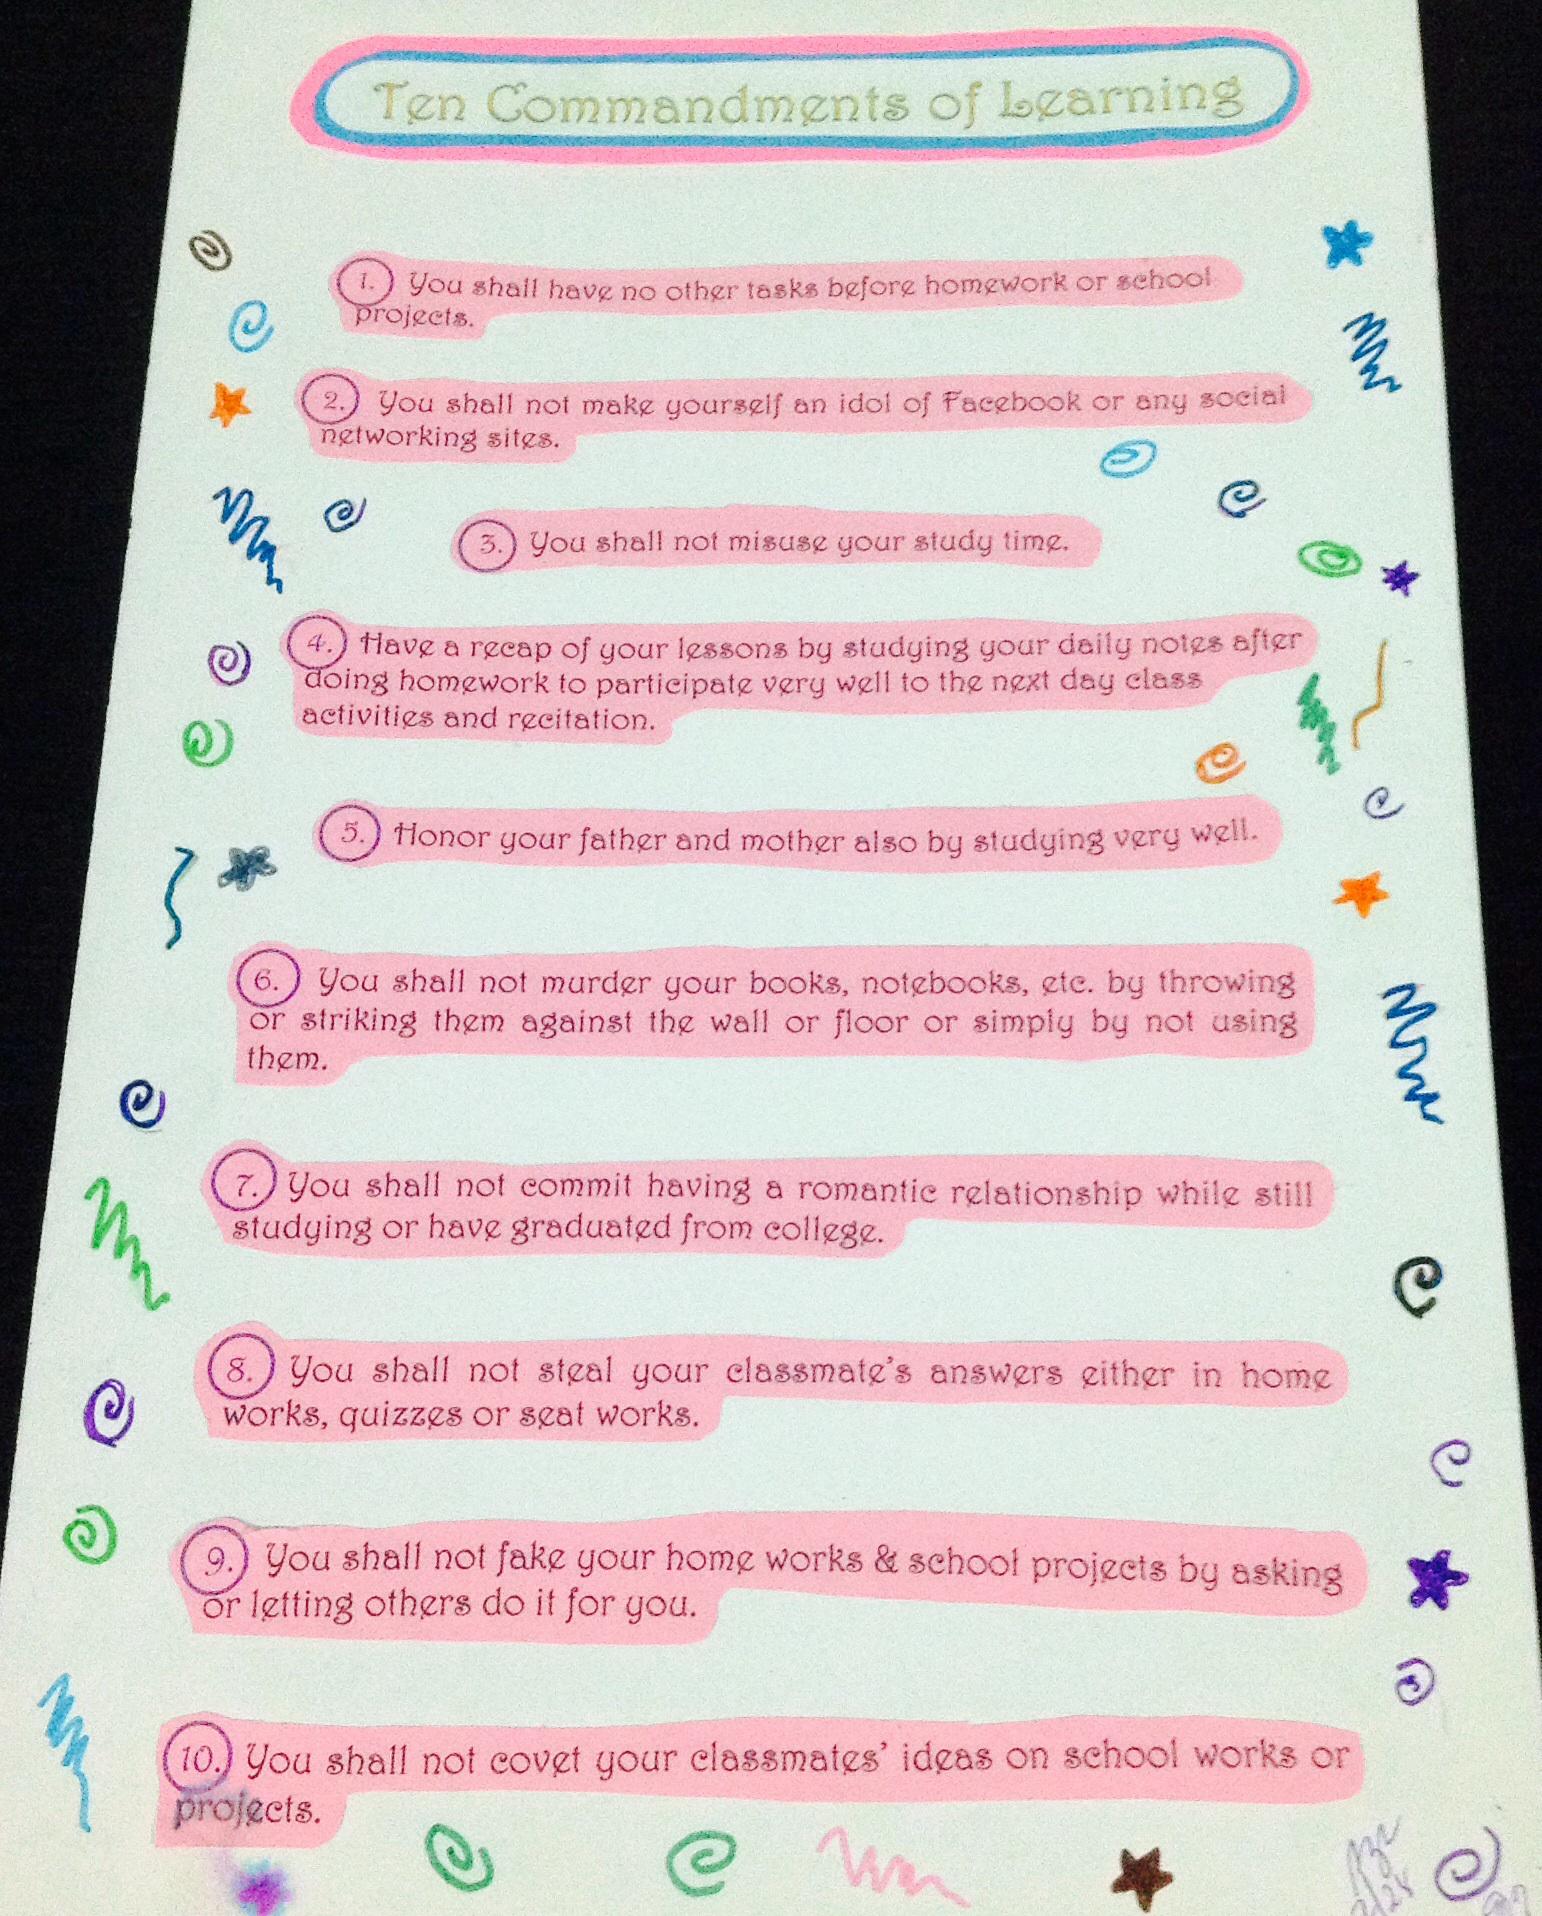 Ten Resume Writing Commandments | Ten Commandments Of Learning